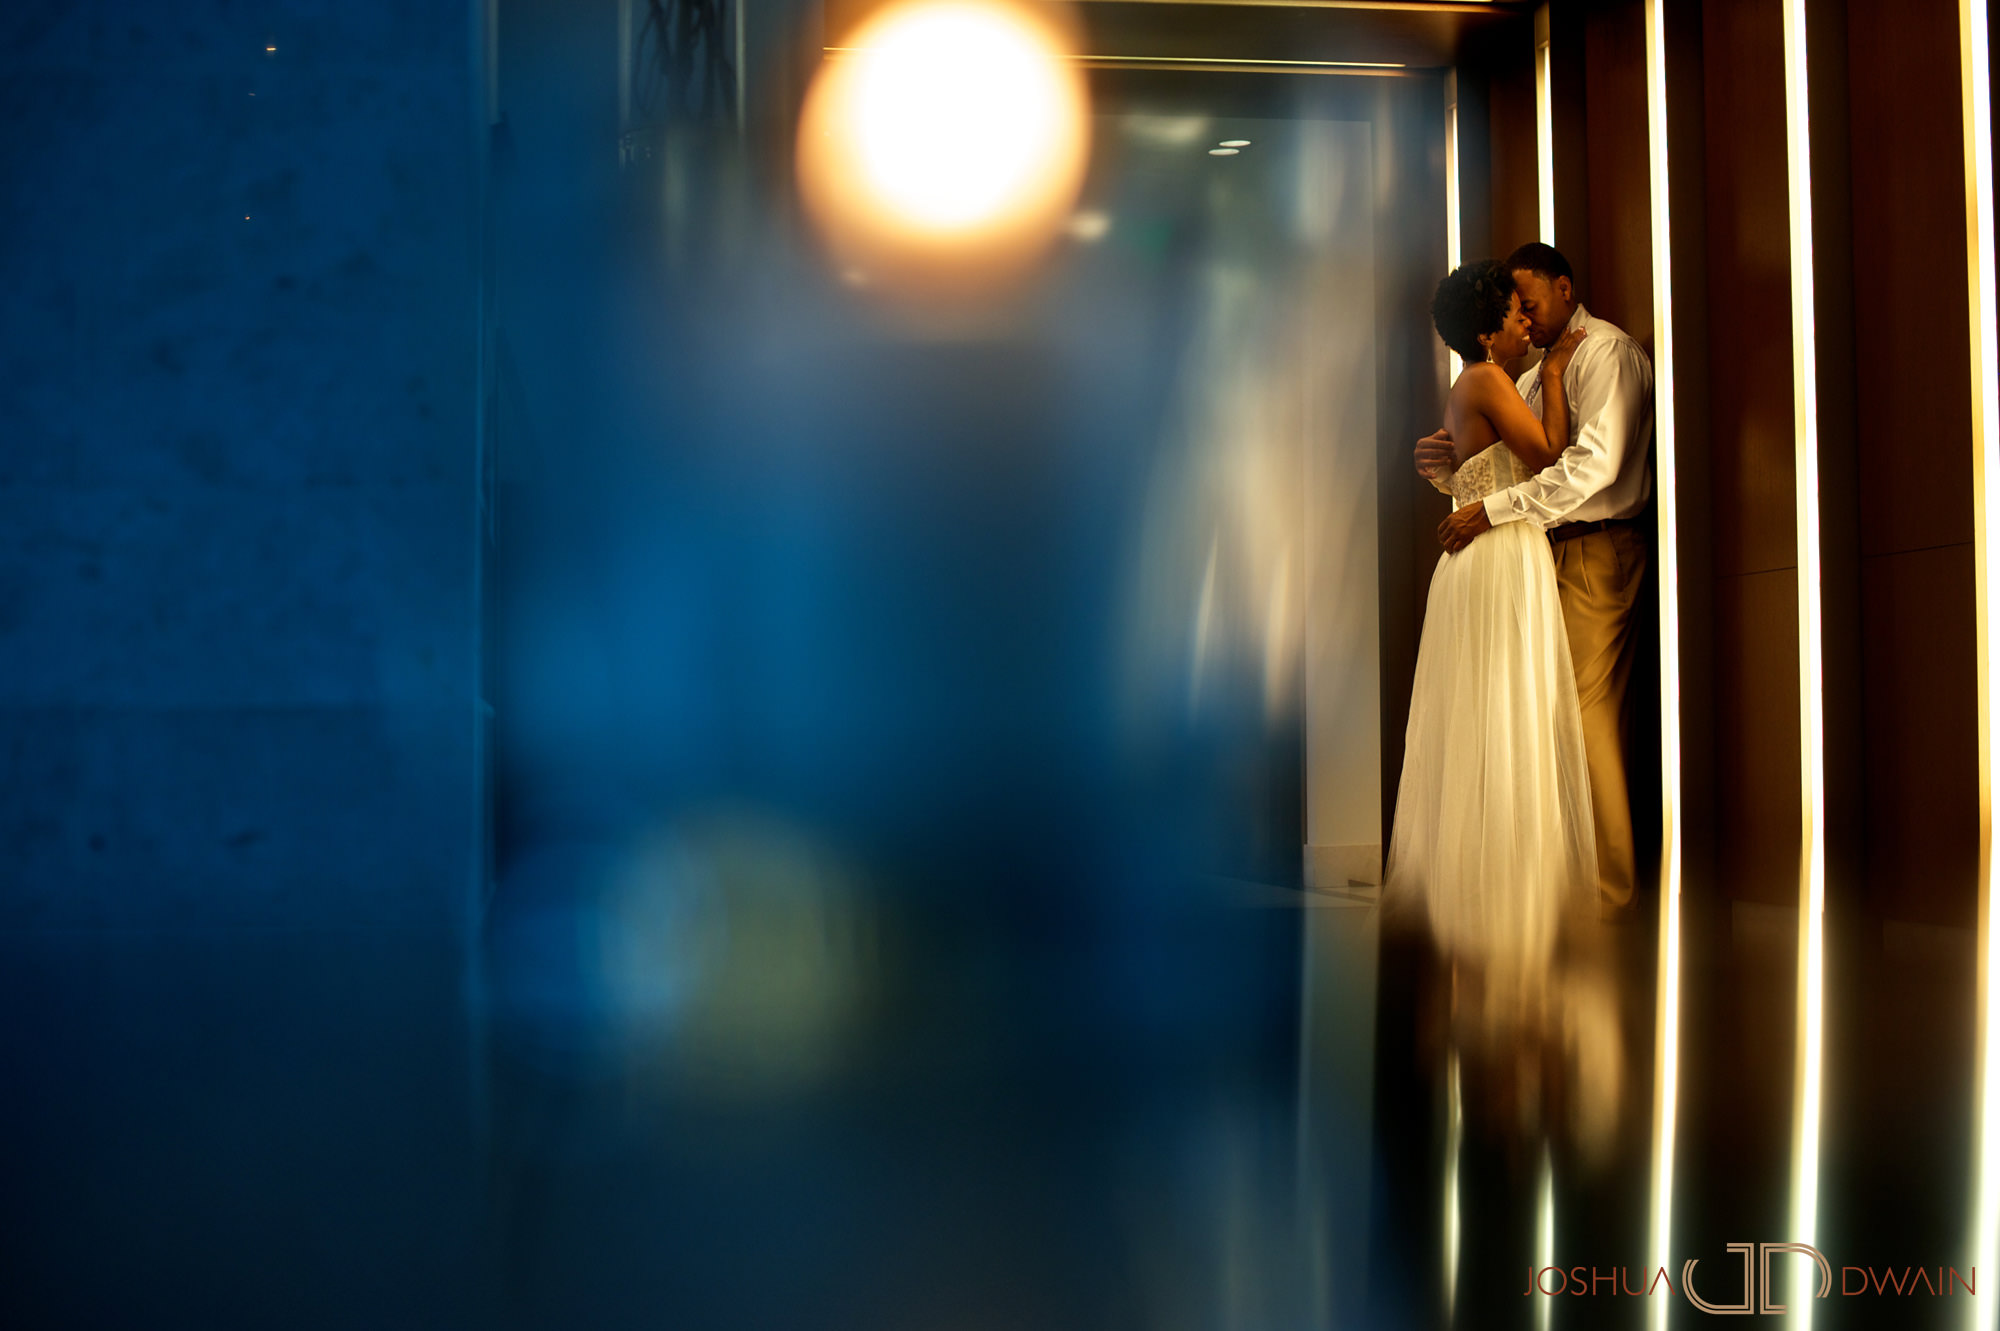 essence-luke-009-radisson-hotel-new-rochelle-ny-engagement-photographer-joshua-dwain-2013-06-26_EL_048